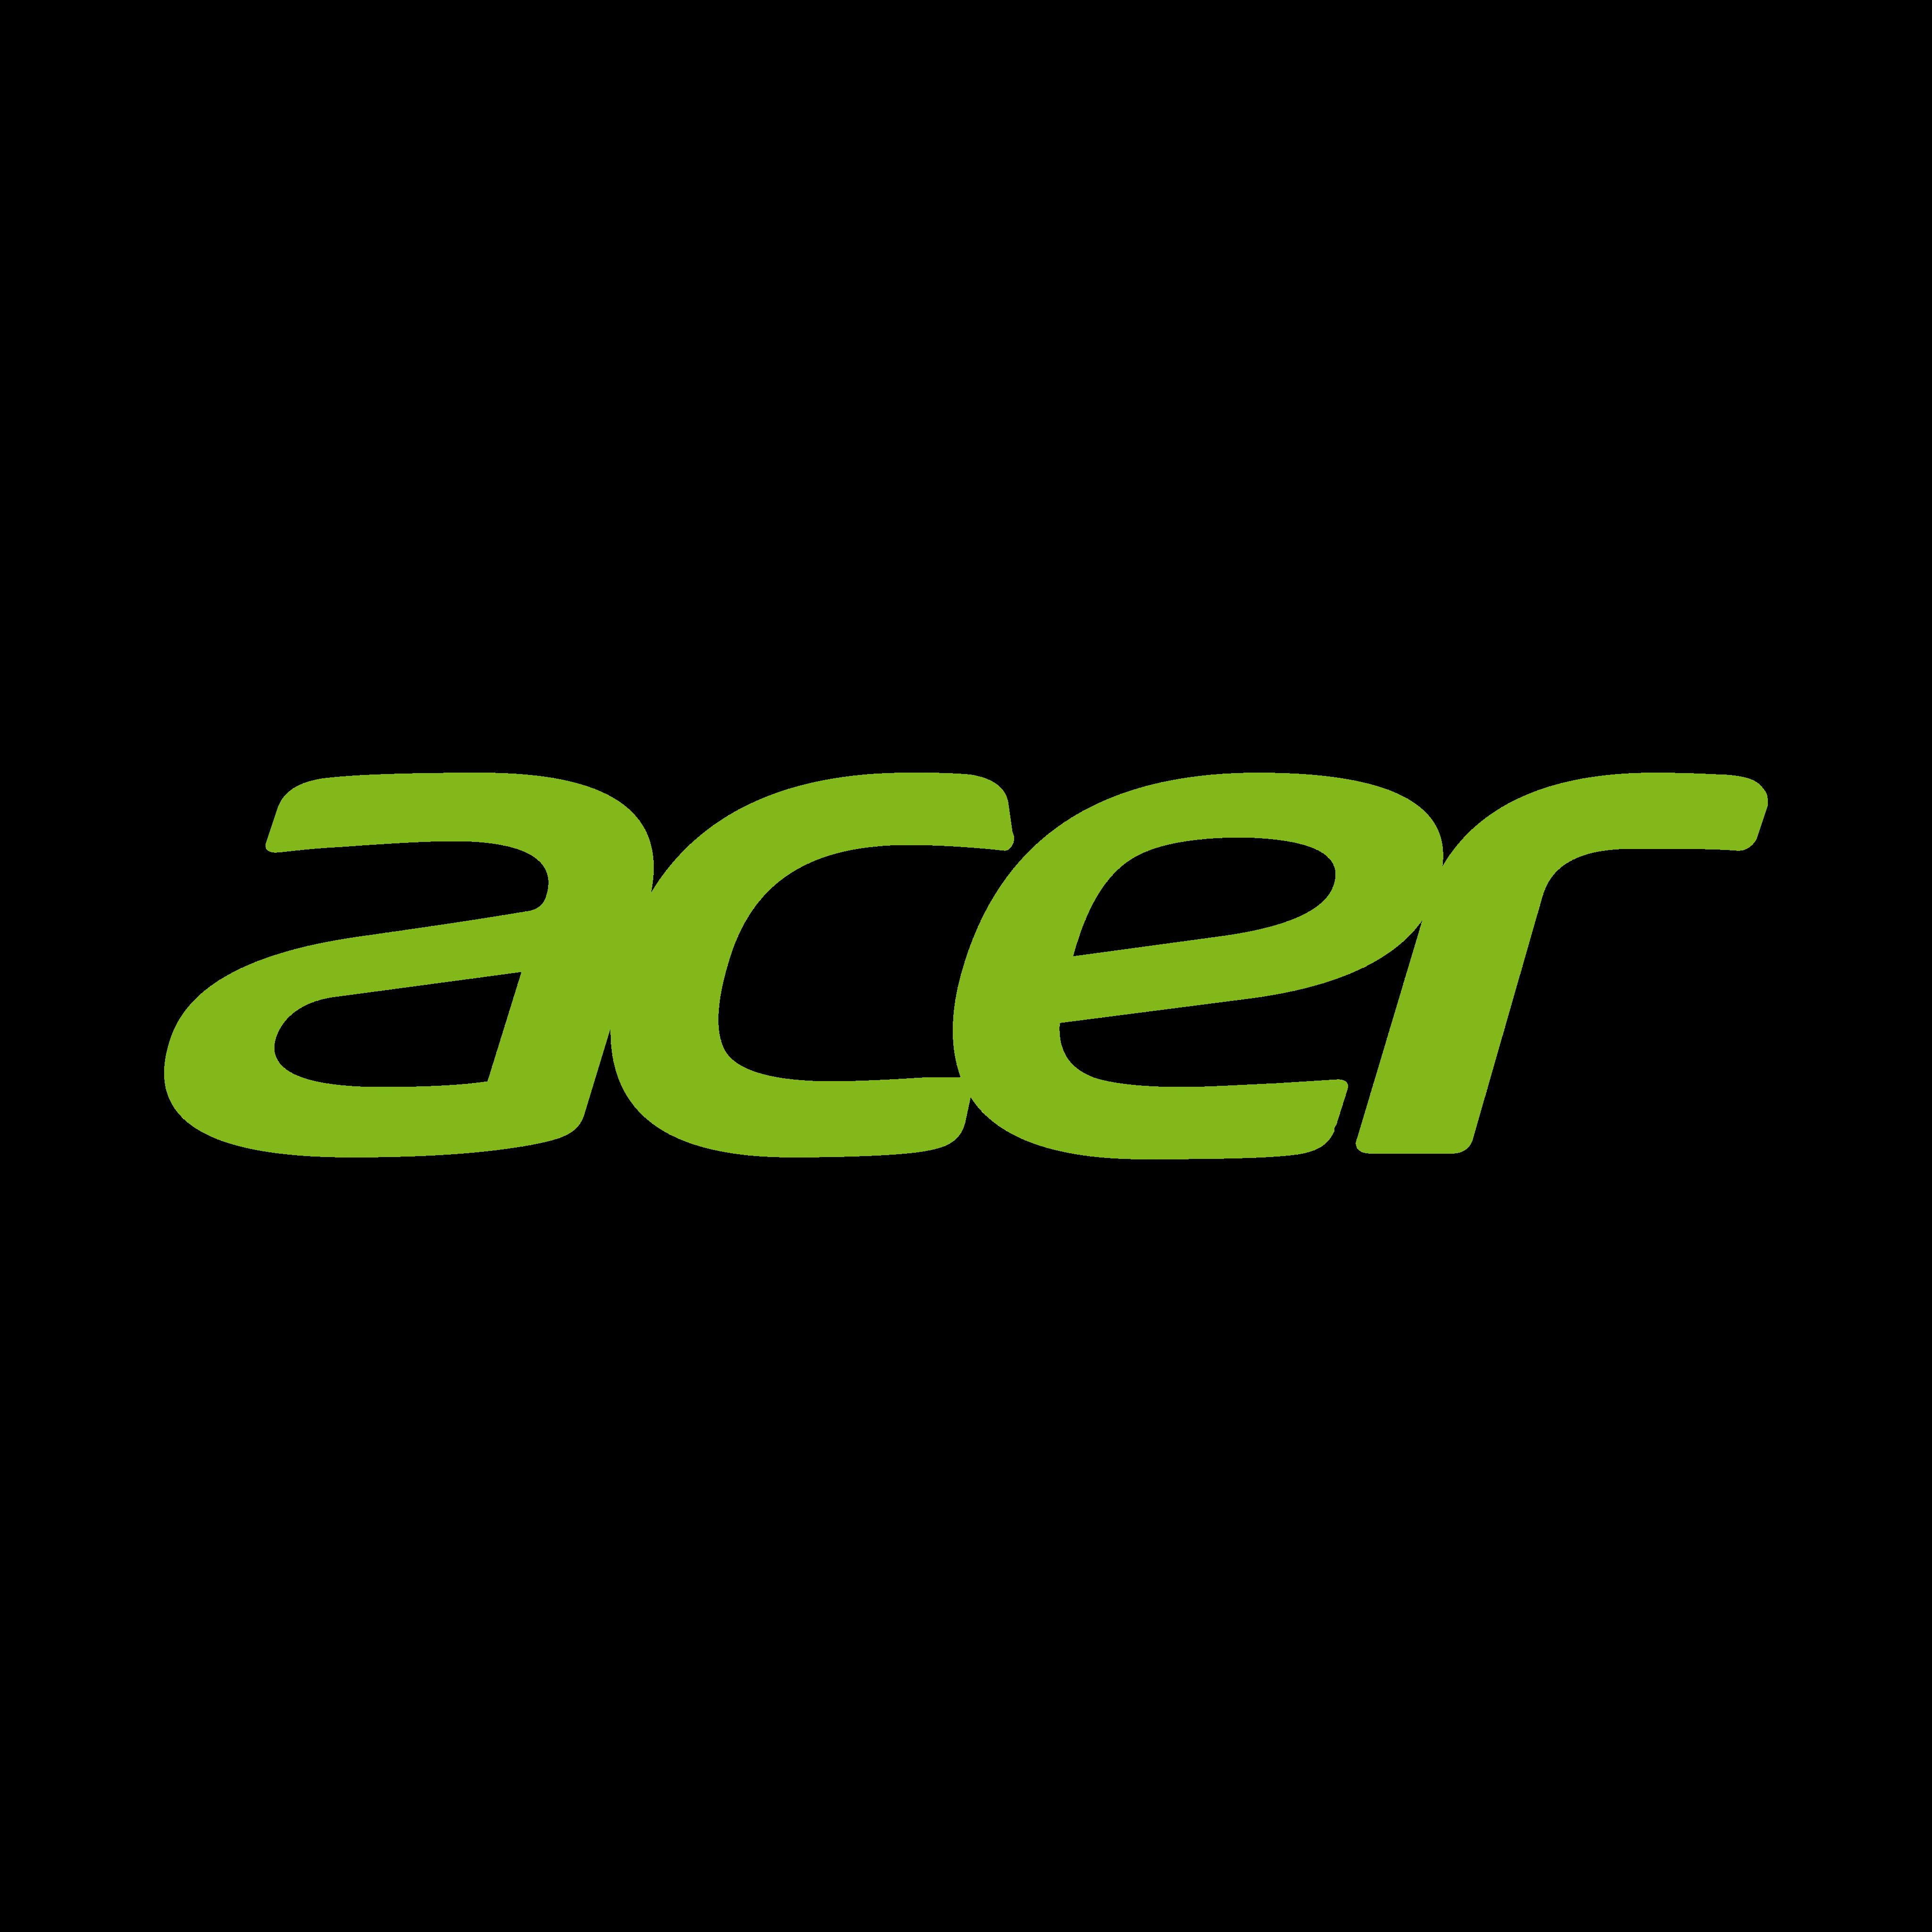 acer logo 0 - Acer Logo